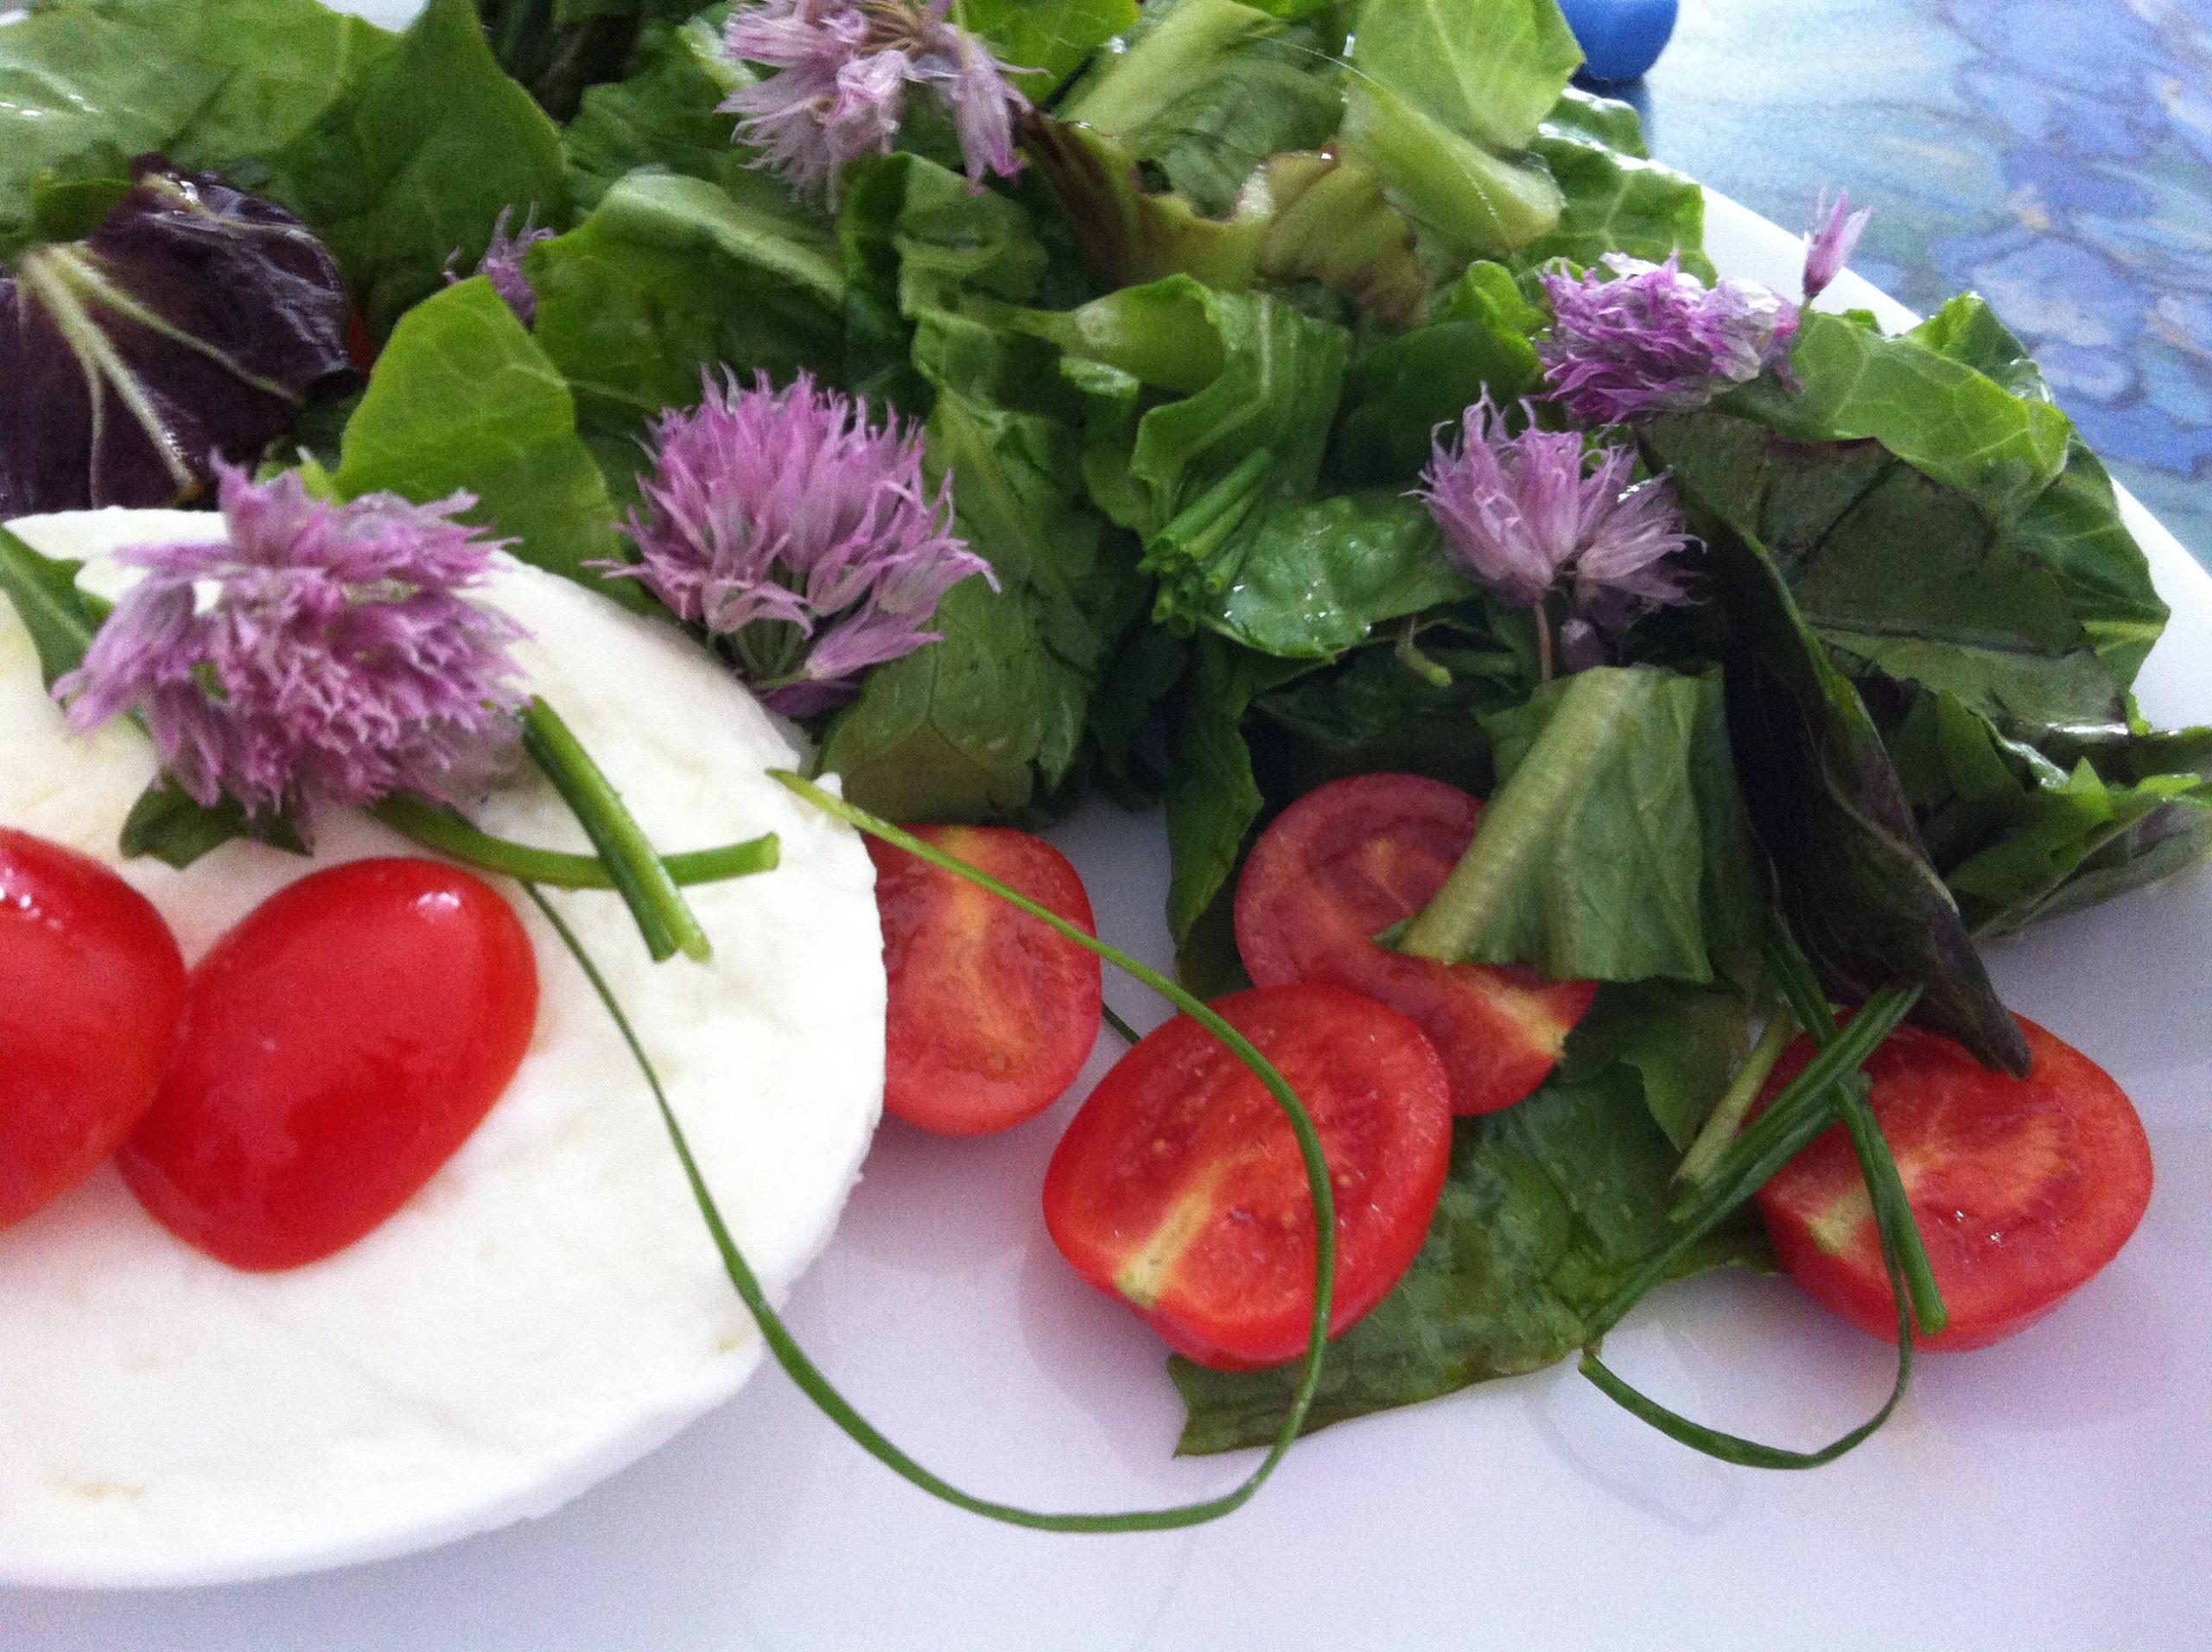 insalata fiorita